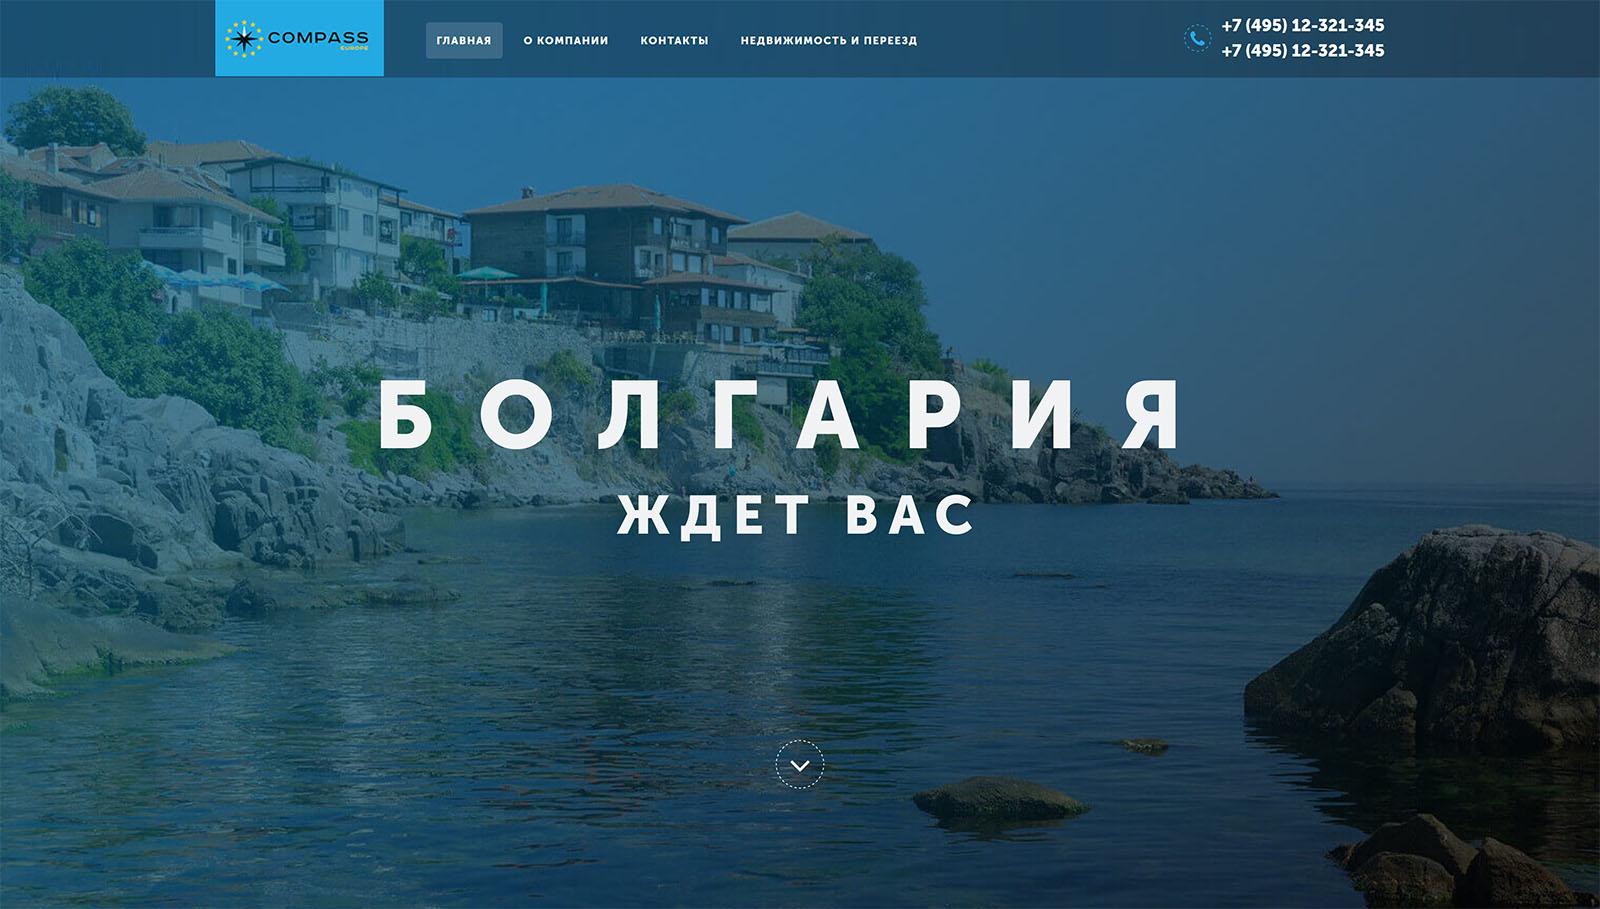 """Compass"" — агентство недвижимости в Болгарии"